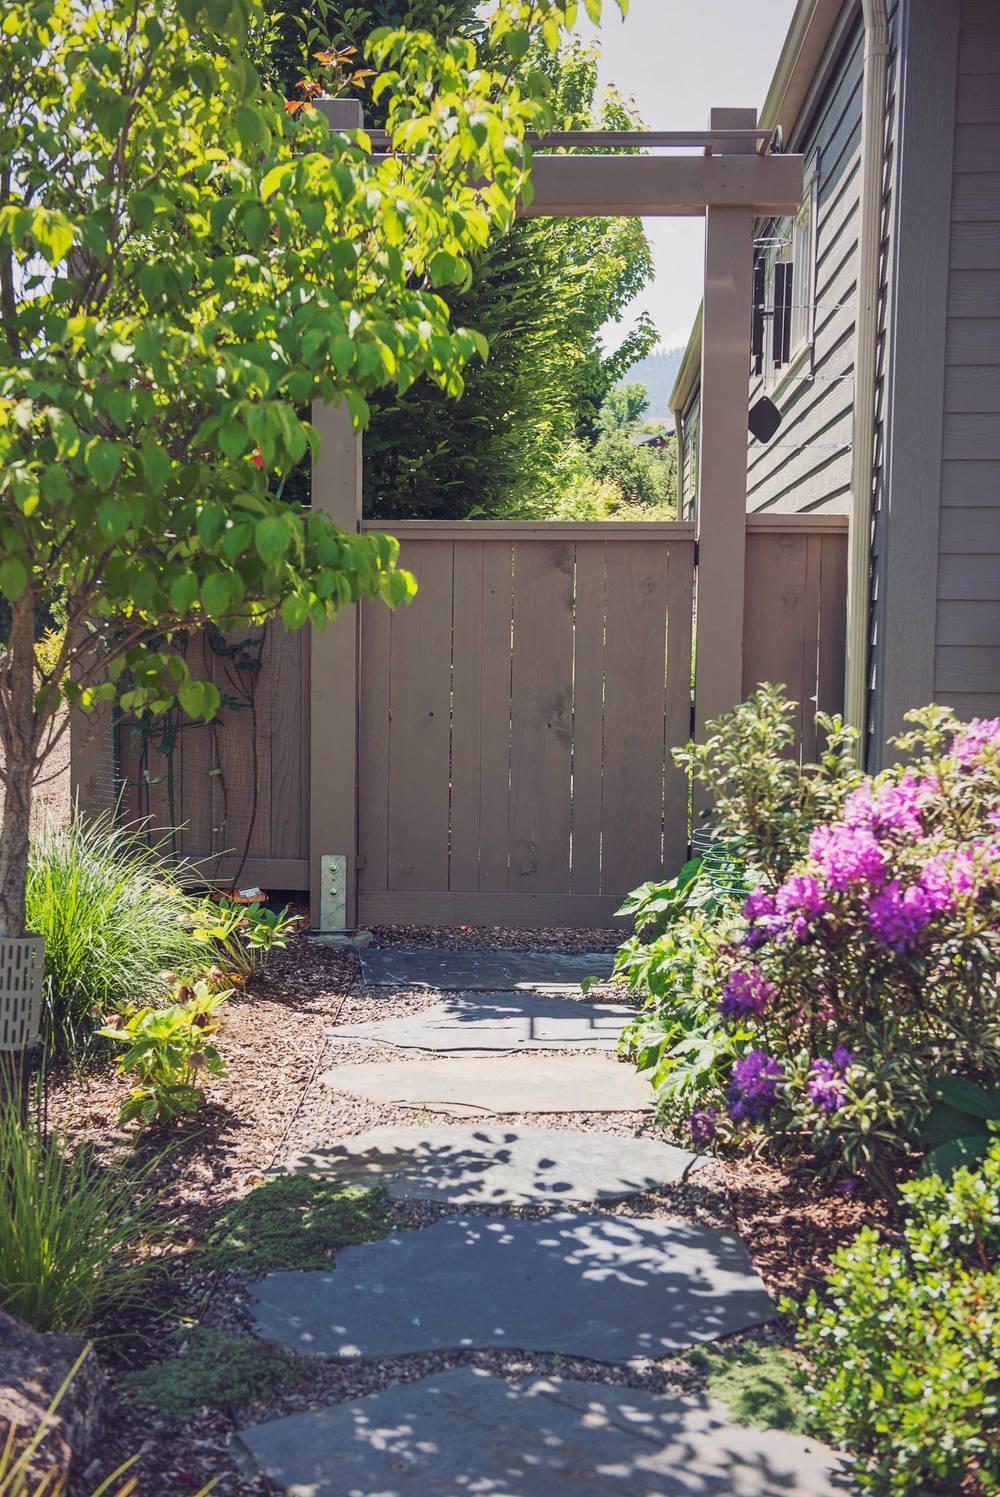 Garden Gate Design with Cedar Privacy Slats and Ornamental Arbor.jpg